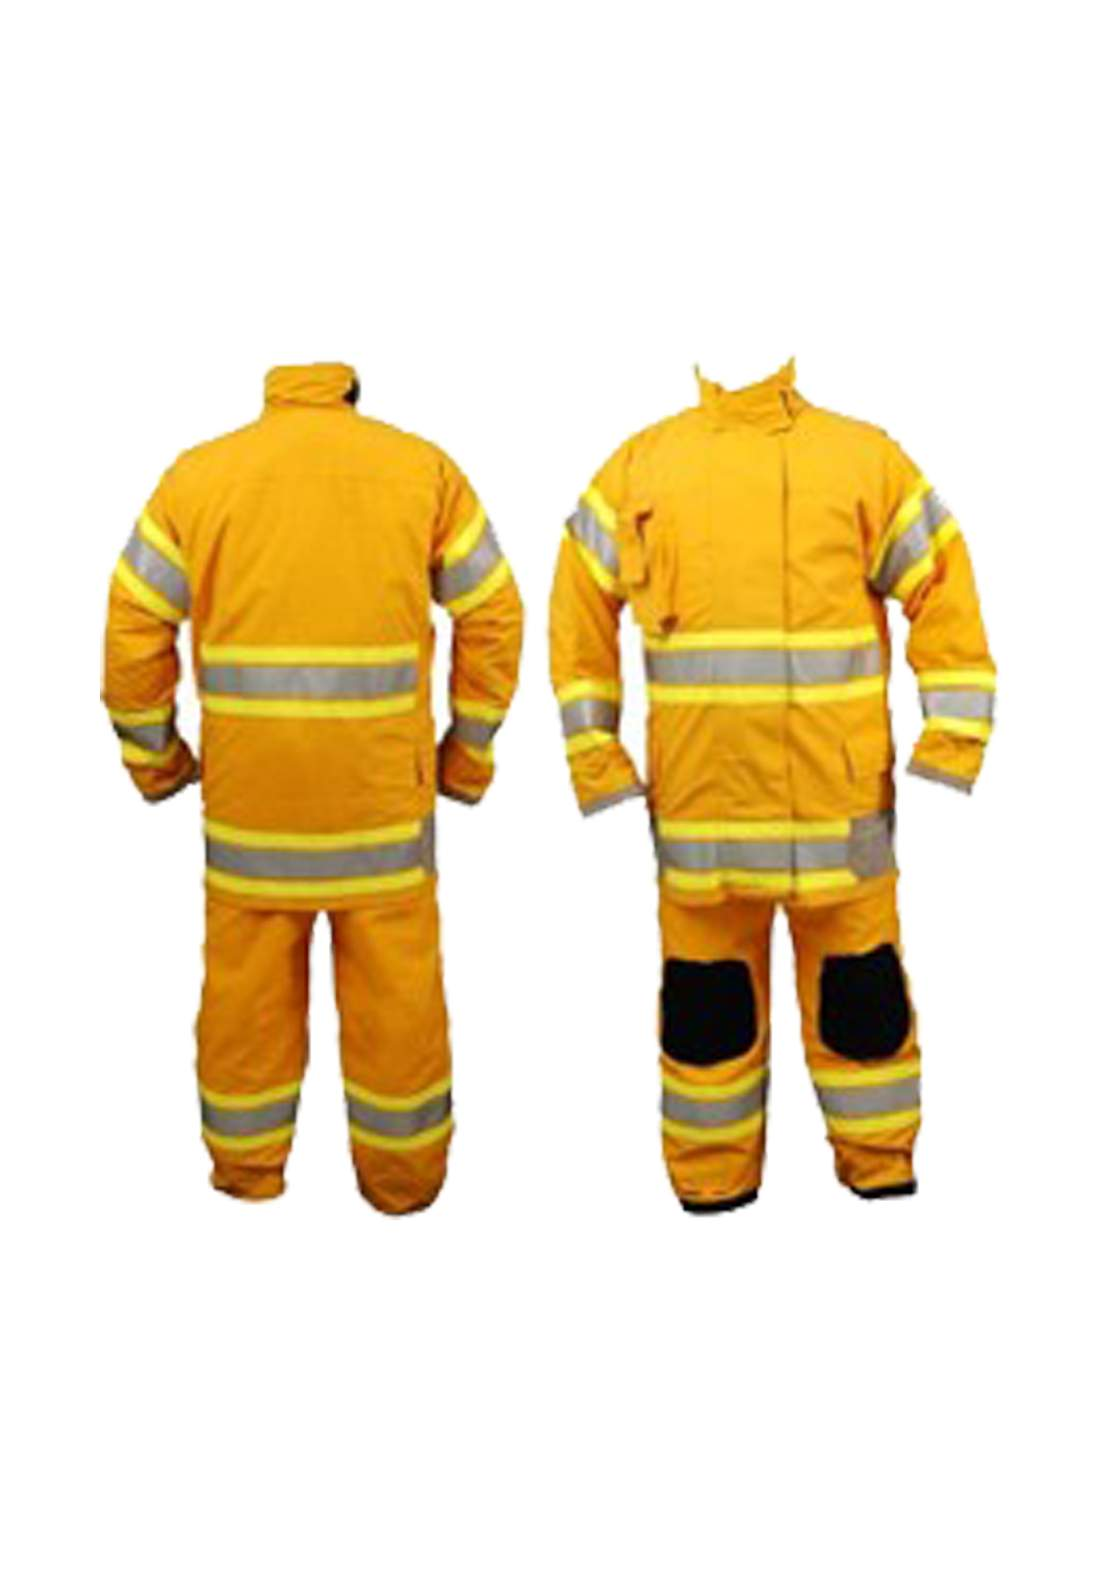 Subul AlHurra Fire Protection Suit بدلة الوقاية من الحريق